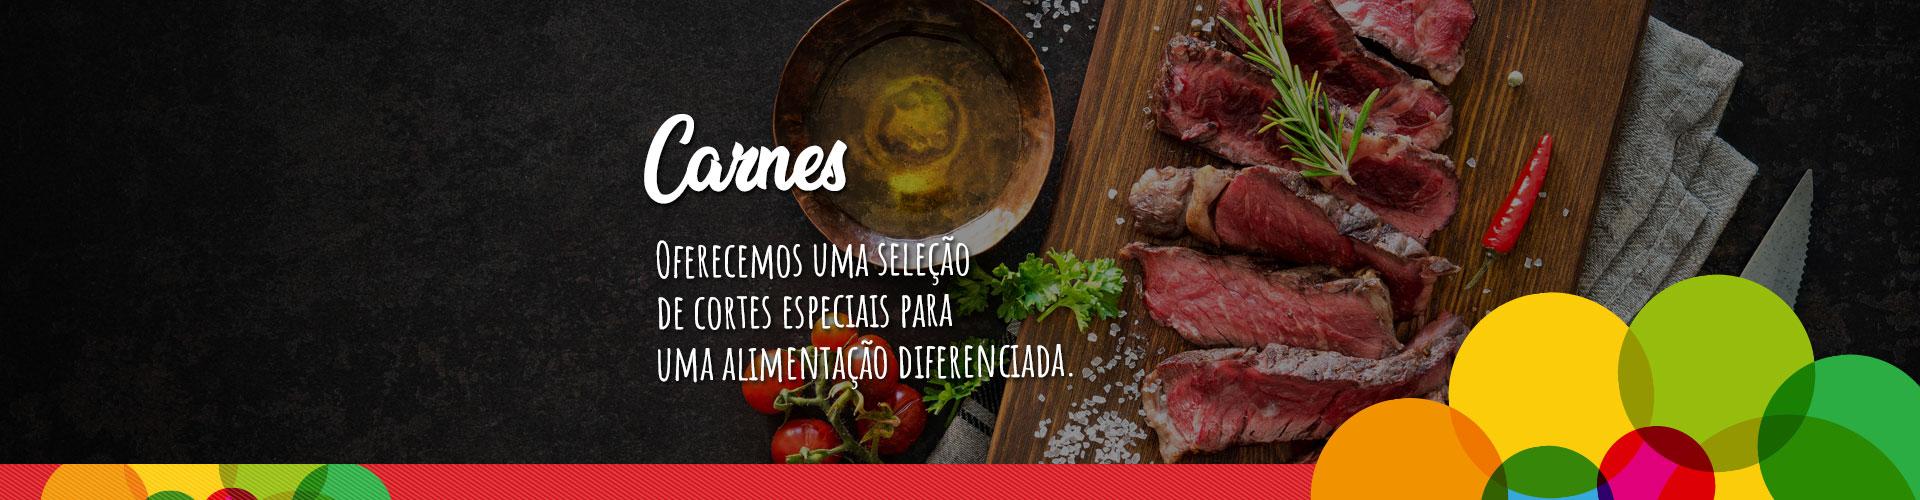 banner-carnes Carnes